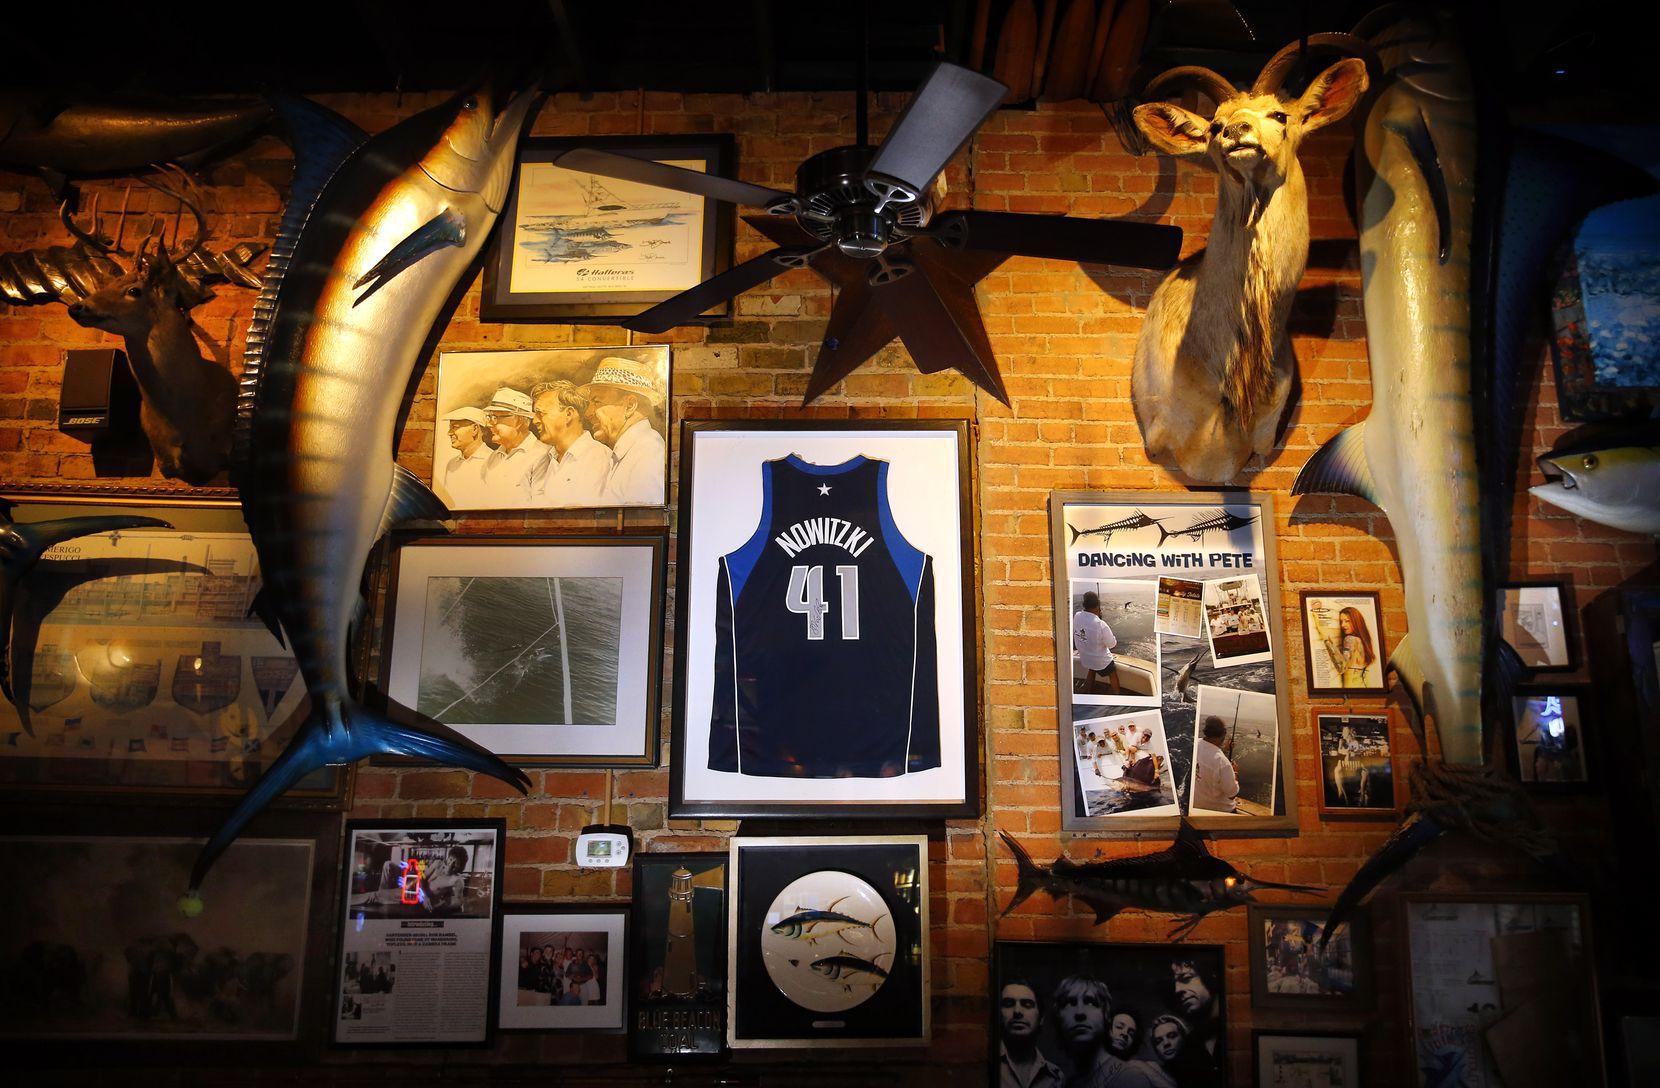 A jersey of Dallas Mavericks Dirk Nowitzki hangs between a pair of mounted swordfish at St. Pete's Dancing Marlin in Deep Ellum in Dallas.